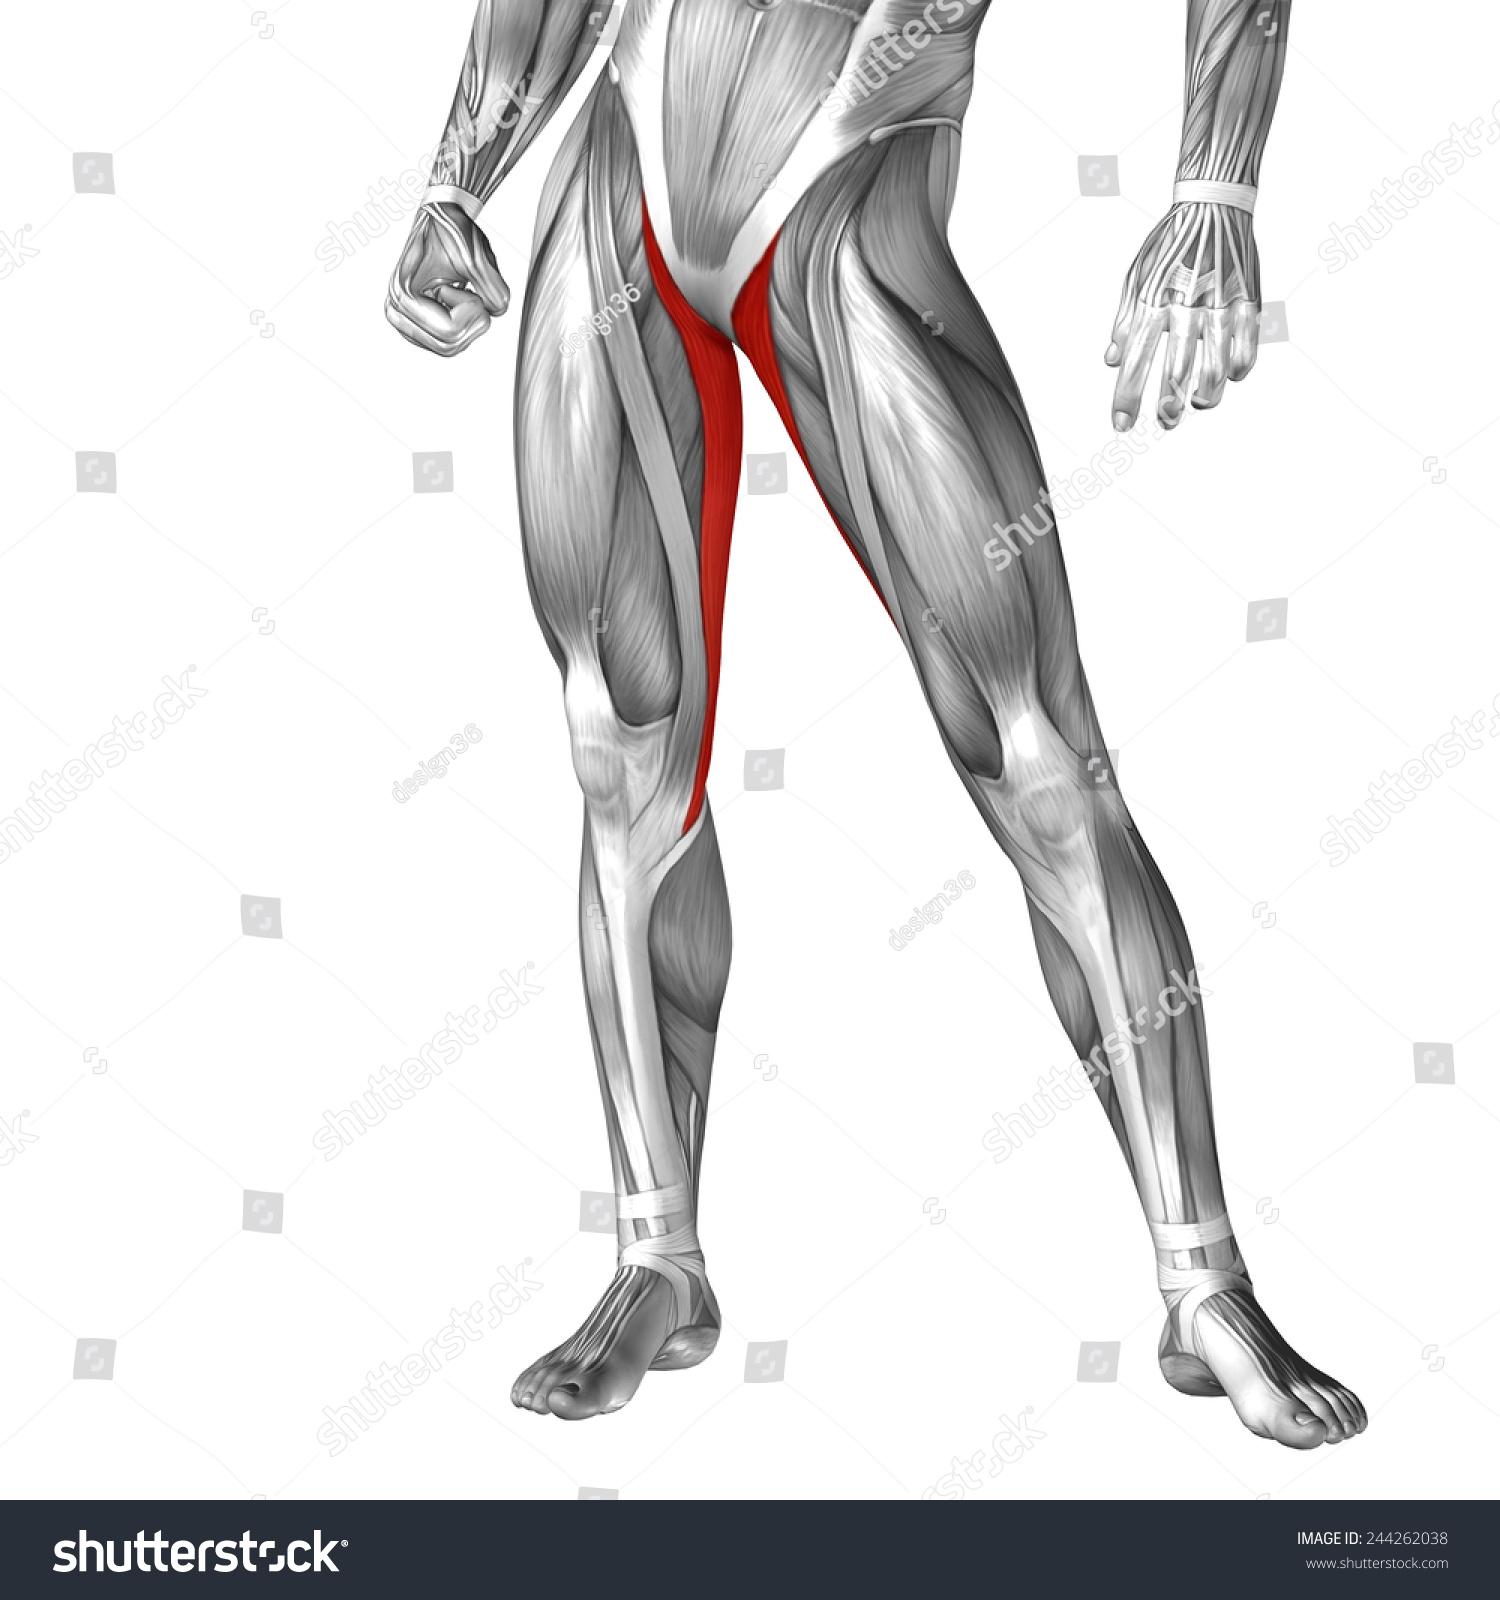 Concept Conceptual 3 D Front Upper Leg Stock Illustration 244262038 ...